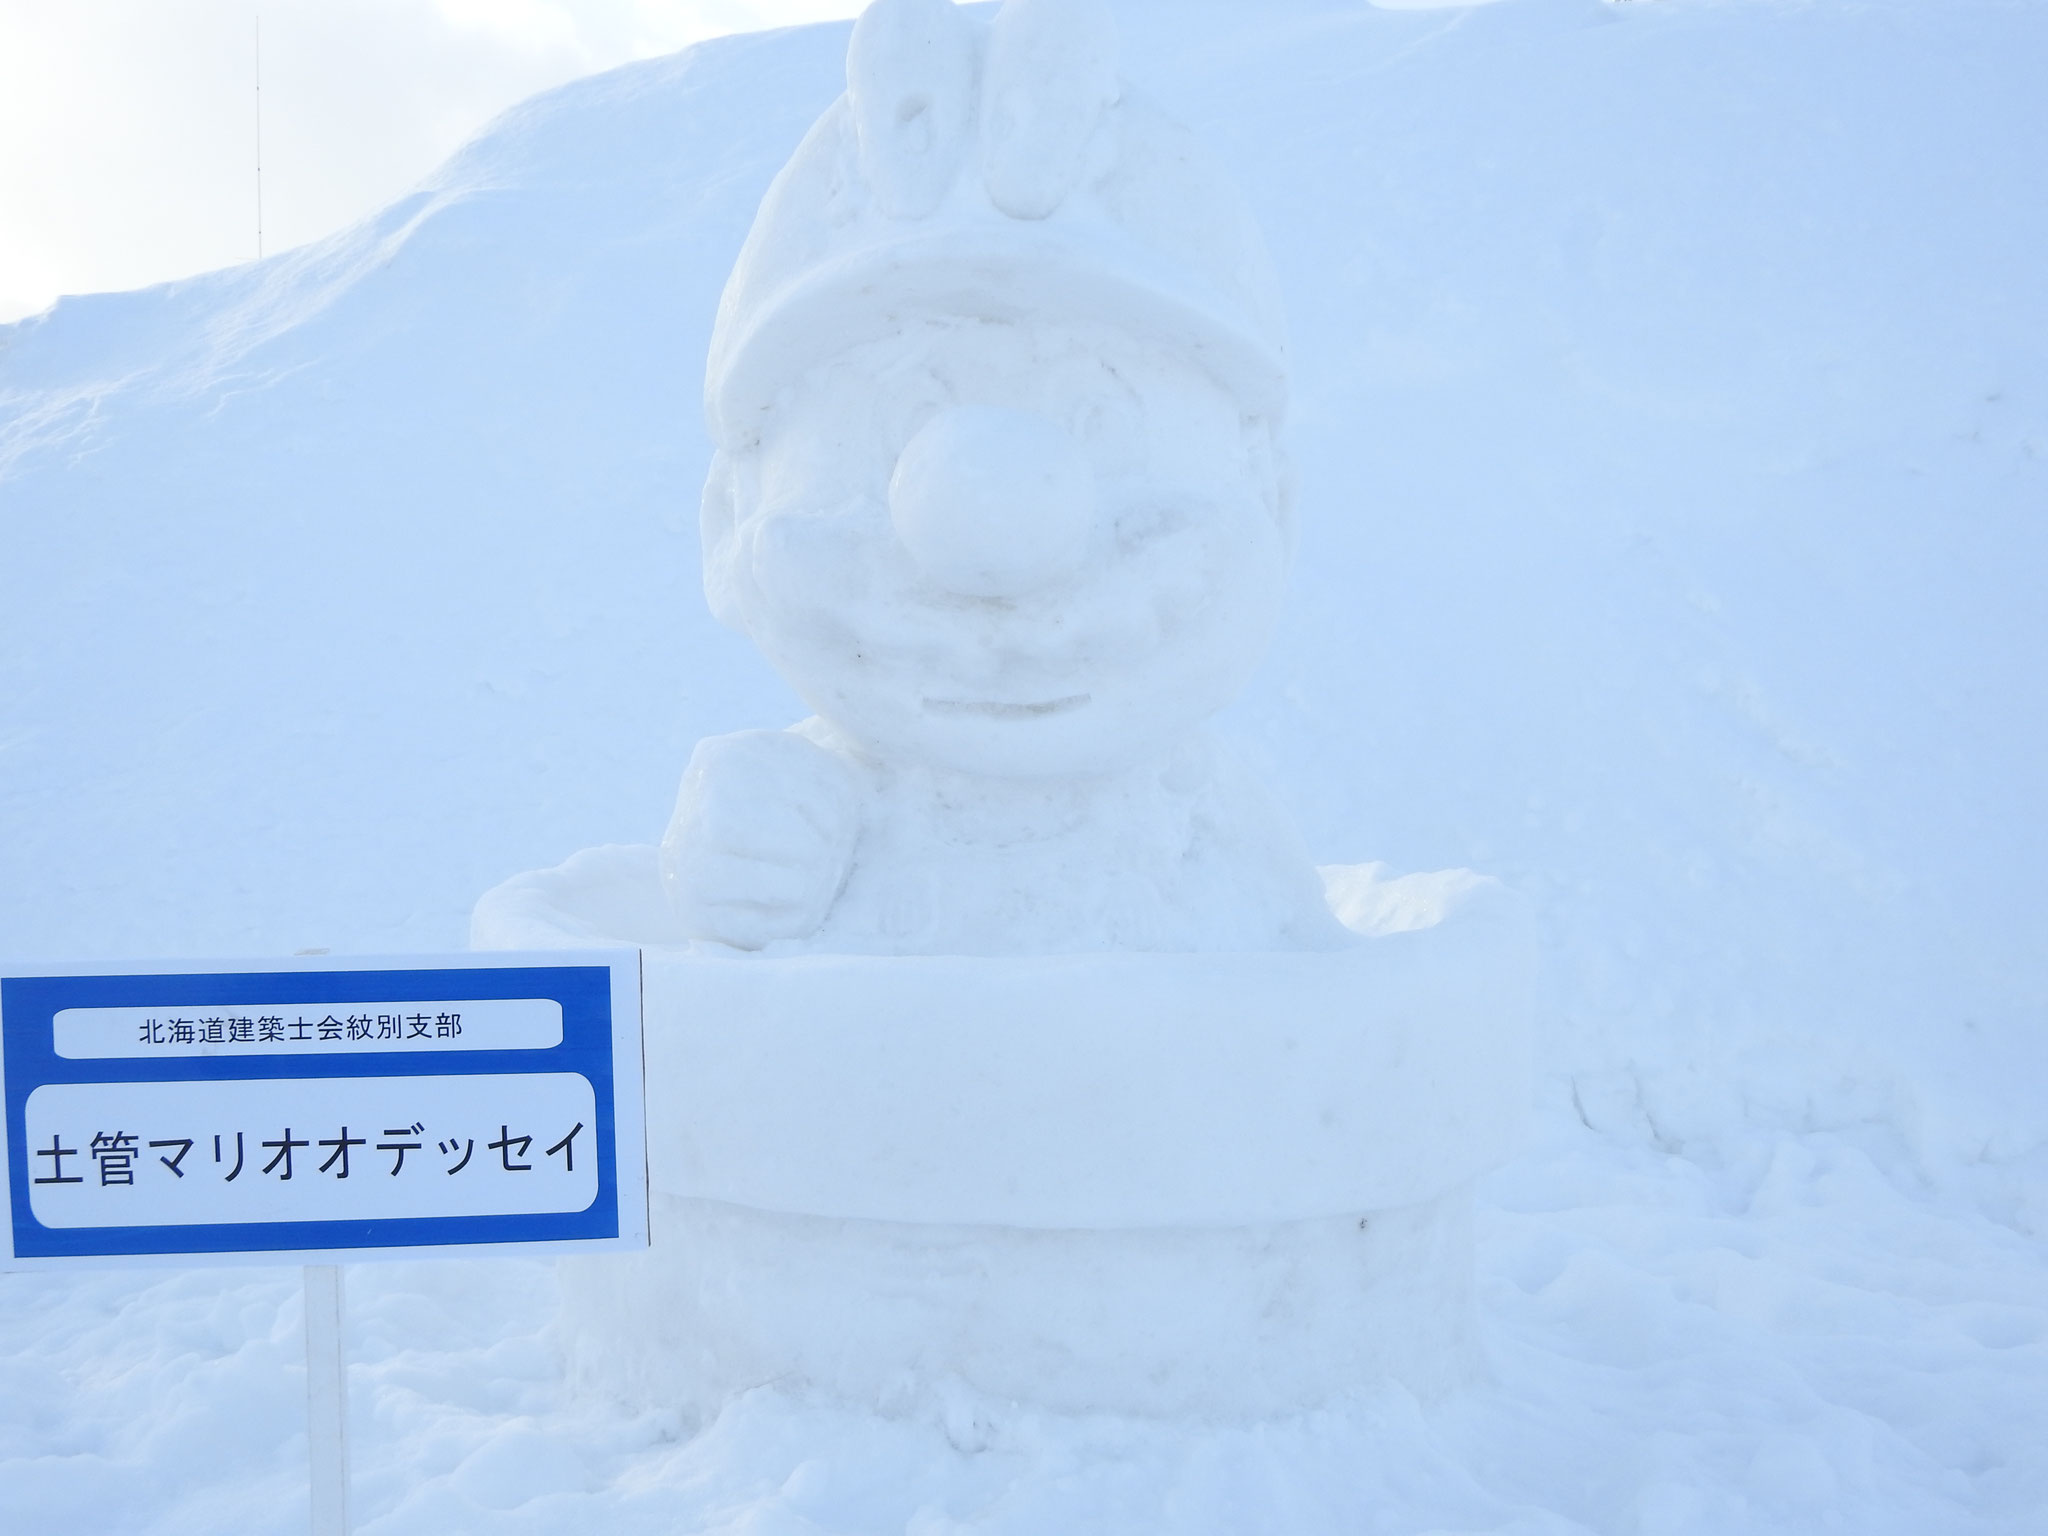 最優秀賞 「土管マリオオデッセイ」 北海道建築士会紋別支部